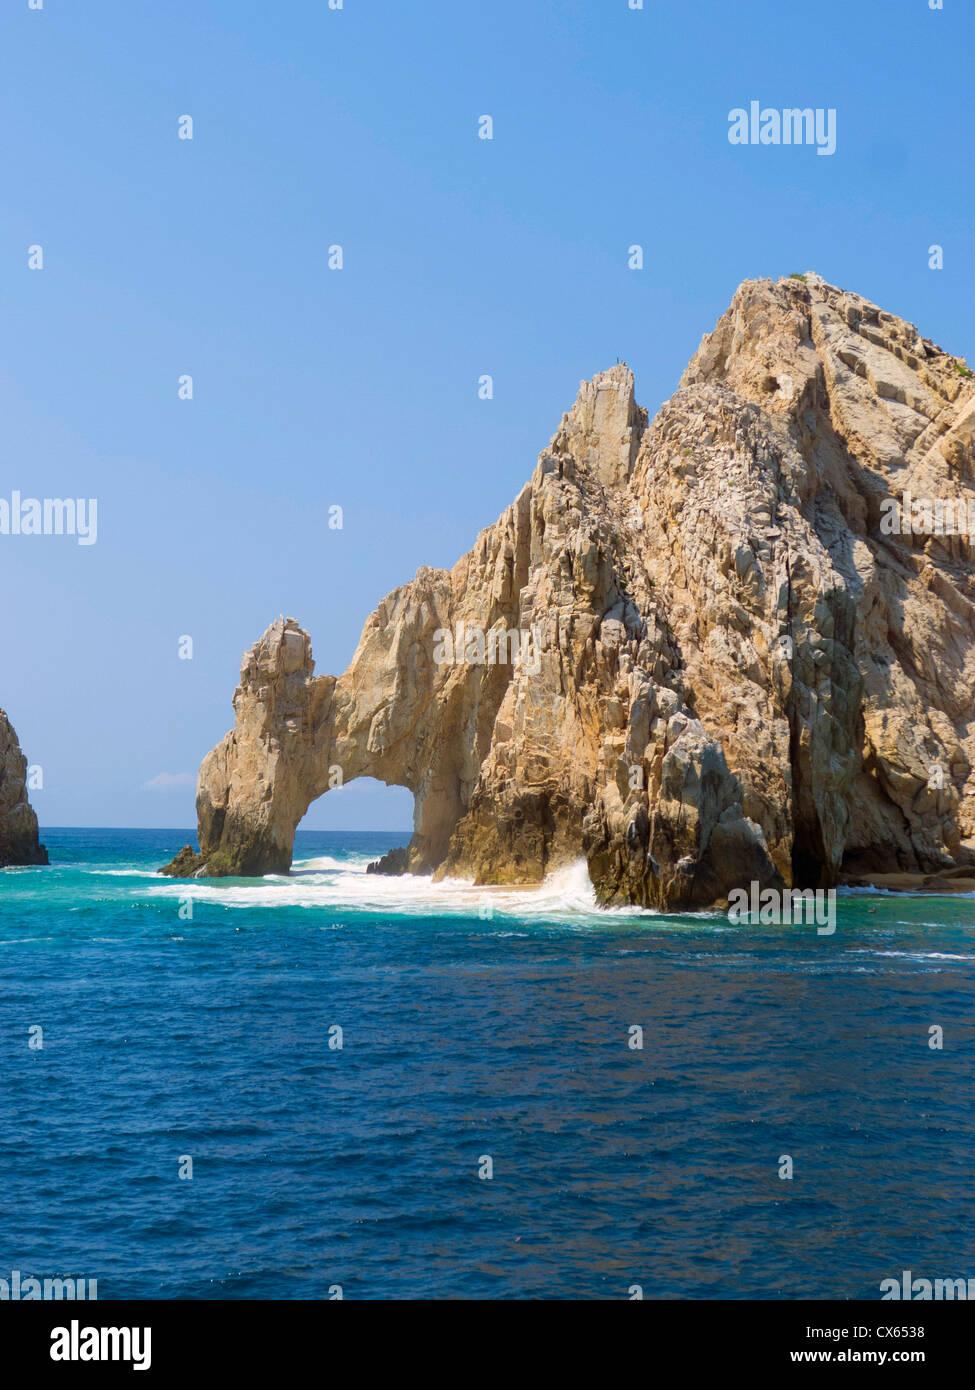 El Arco, l'arco, Cabo San Lucas, Baja, Messico Immagini Stock